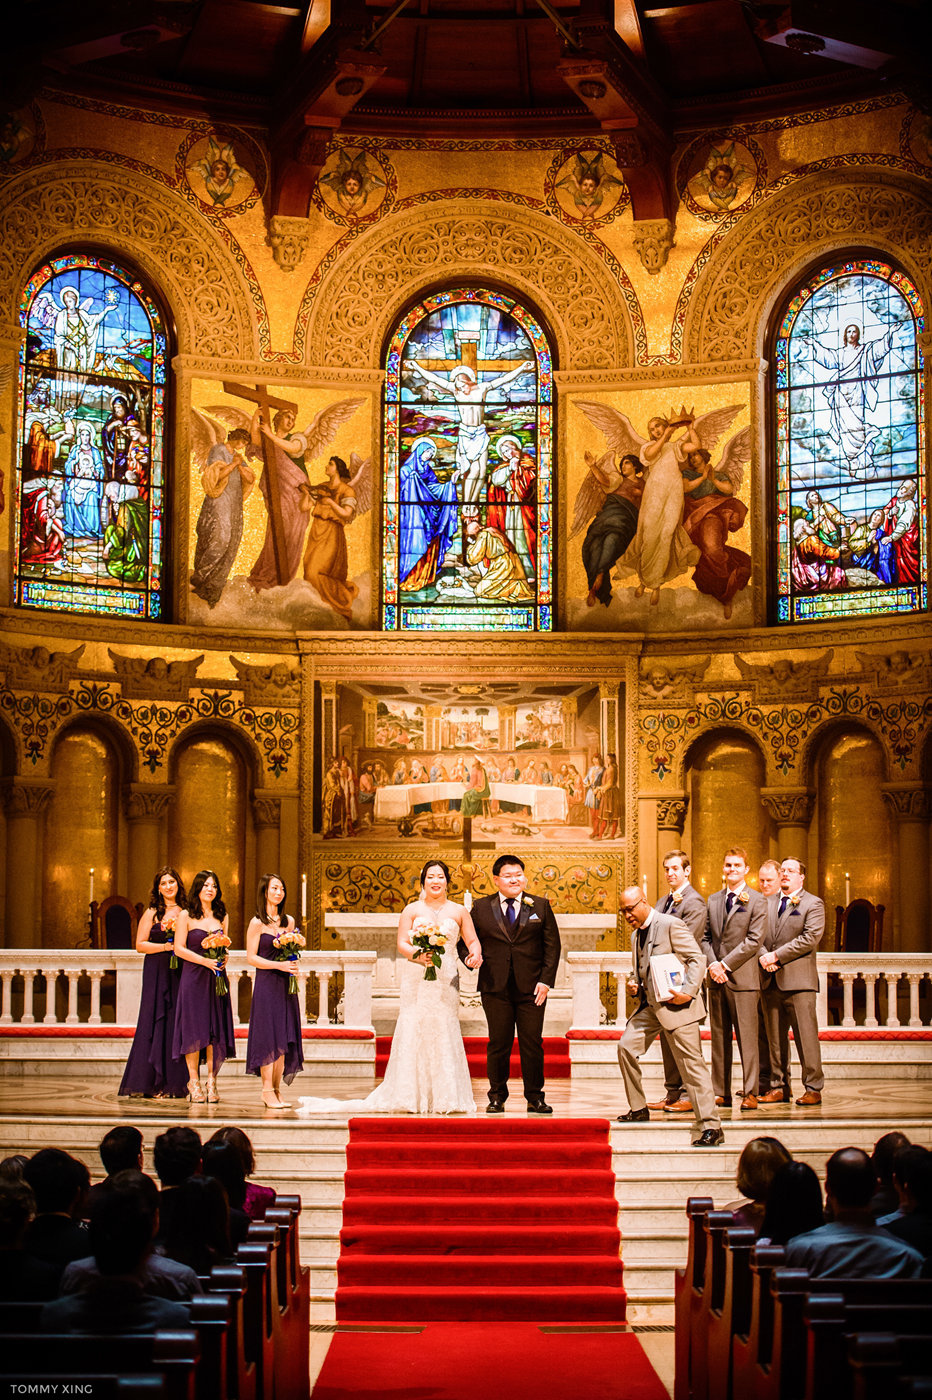 STANFORD MEMORIAL CHURCH WEDDING - Wenjie & Chengcheng - SAN FRANCISCO BAY AREA 斯坦福教堂婚礼跟拍 - 洛杉矶婚礼婚纱照摄影师 Tommy Xing Photography113.jpg